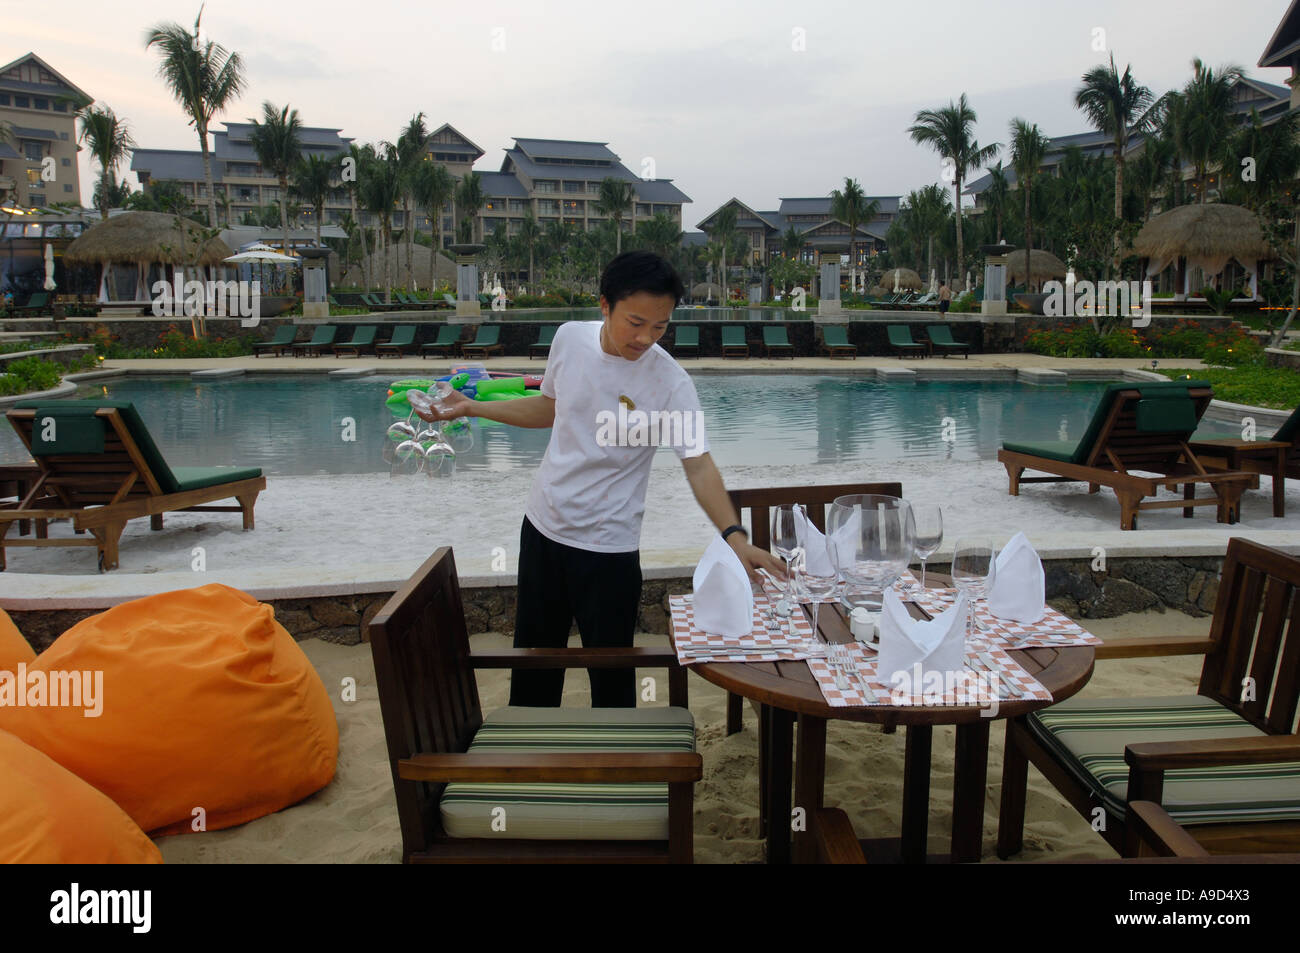 The Hilton Sanya Resort and Spa. 31-Mar-2006 - Stock Image